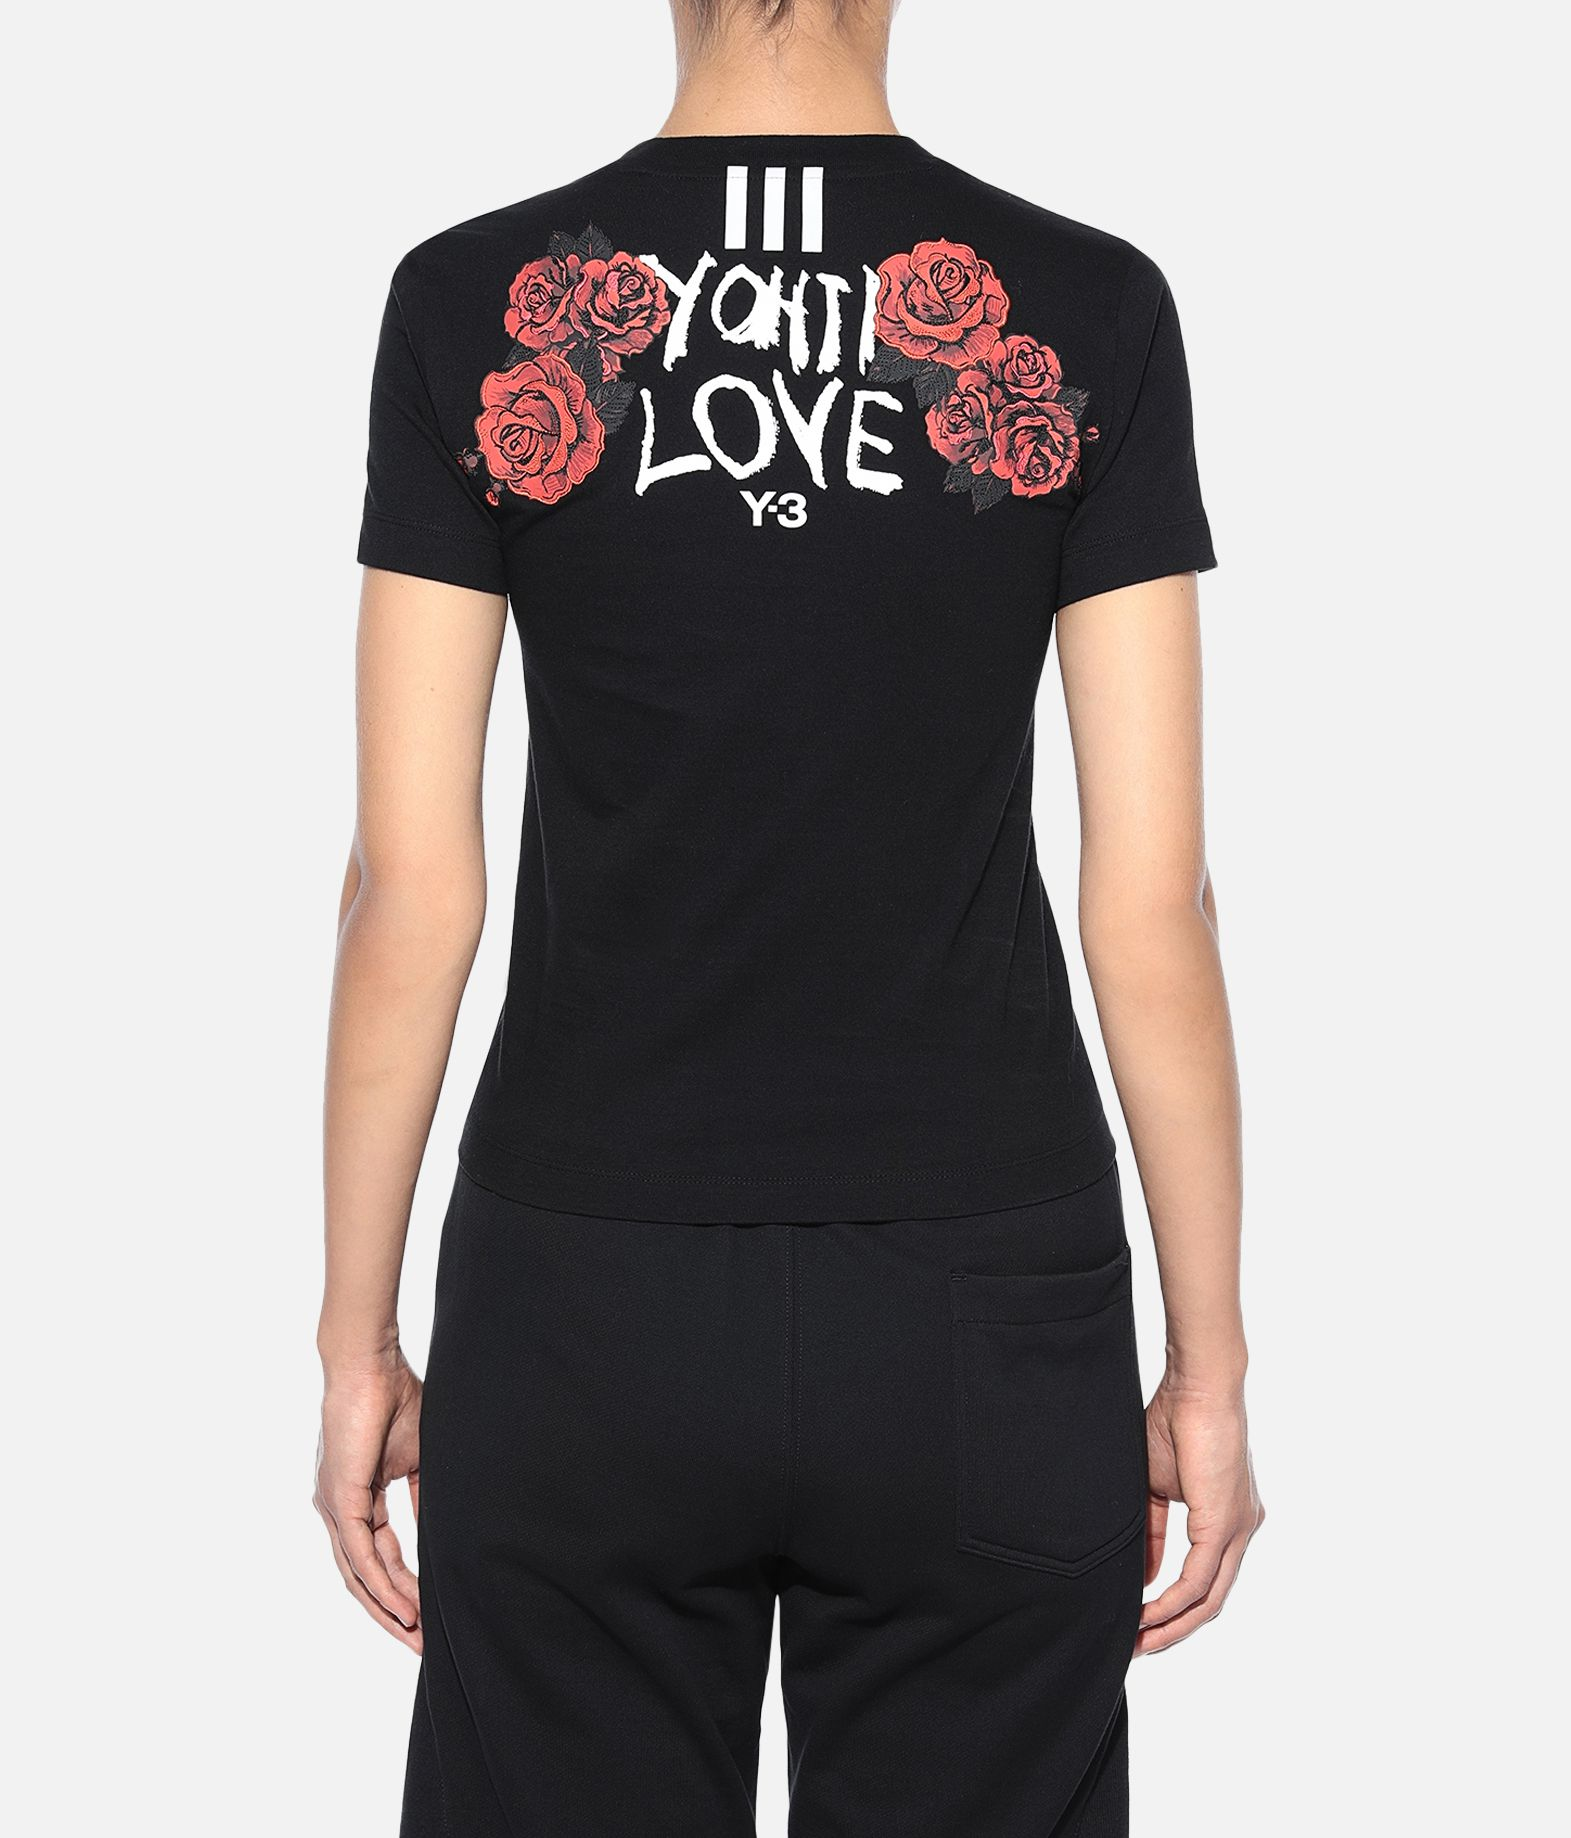 Y-3 Y-3 Yohji Love Tubular Tee Kurzärmliges T-shirt Damen d